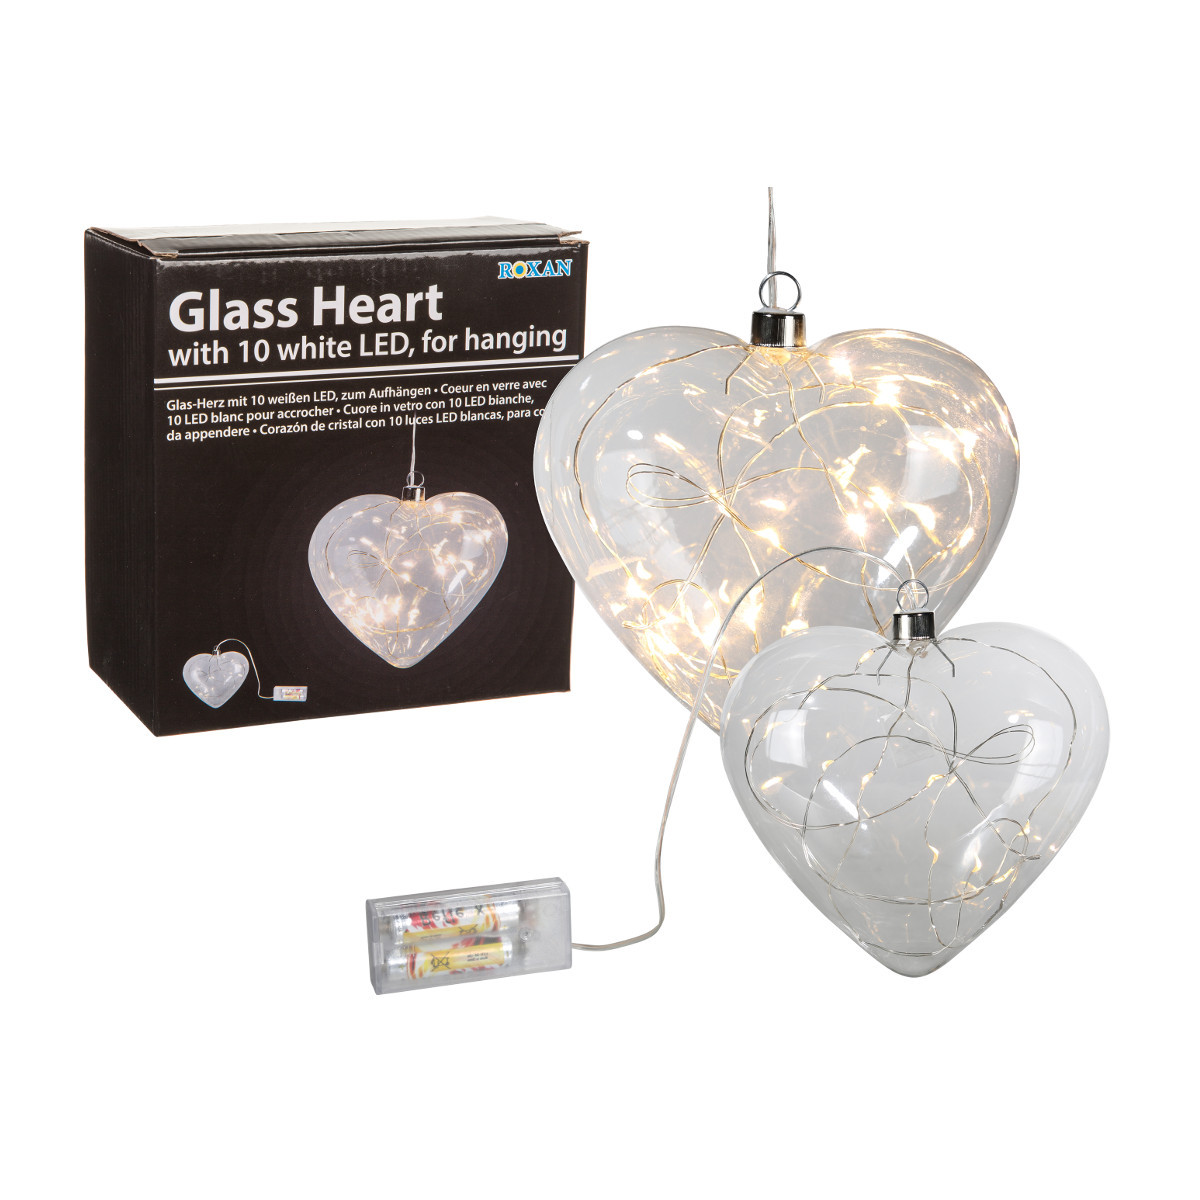 Lasiset sisustusvalot LED-lampuin